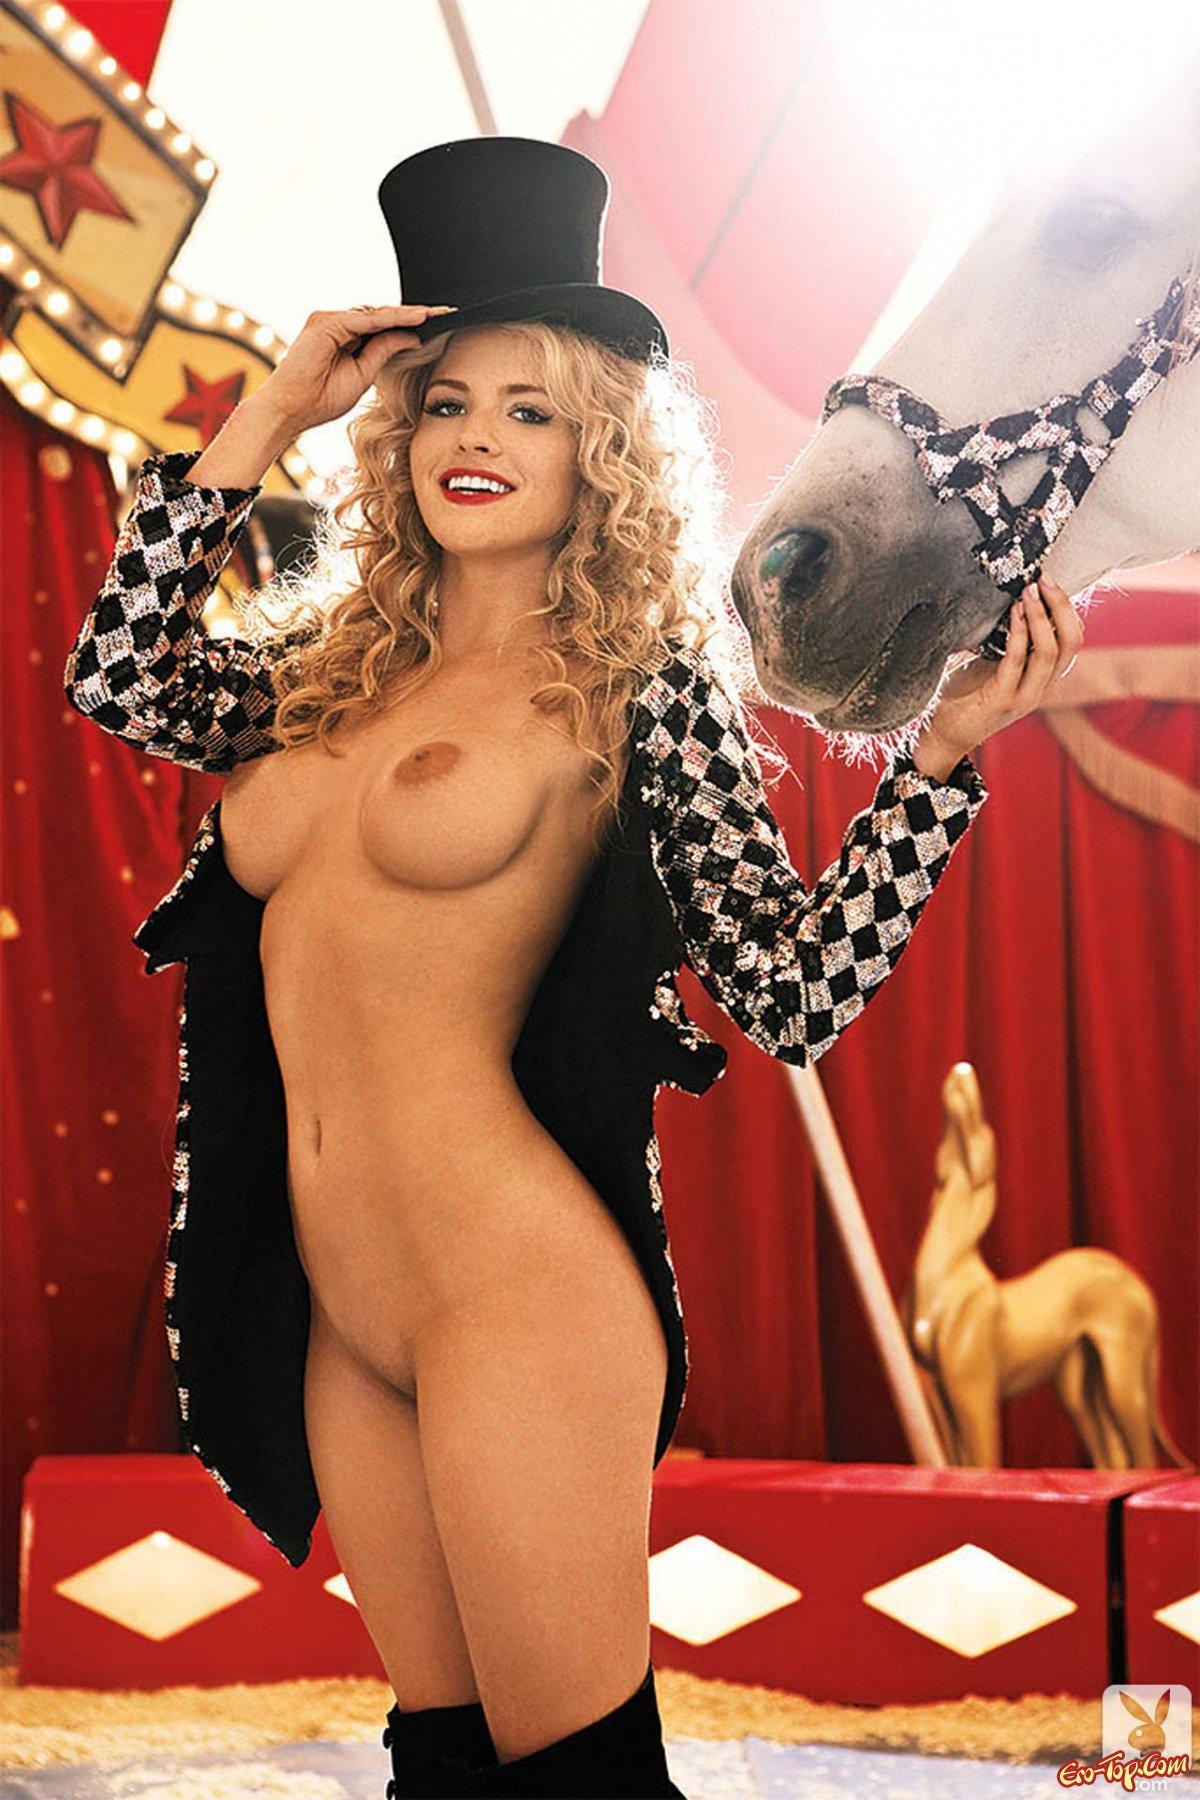 tsirkovoe-eroticheskoe-foto